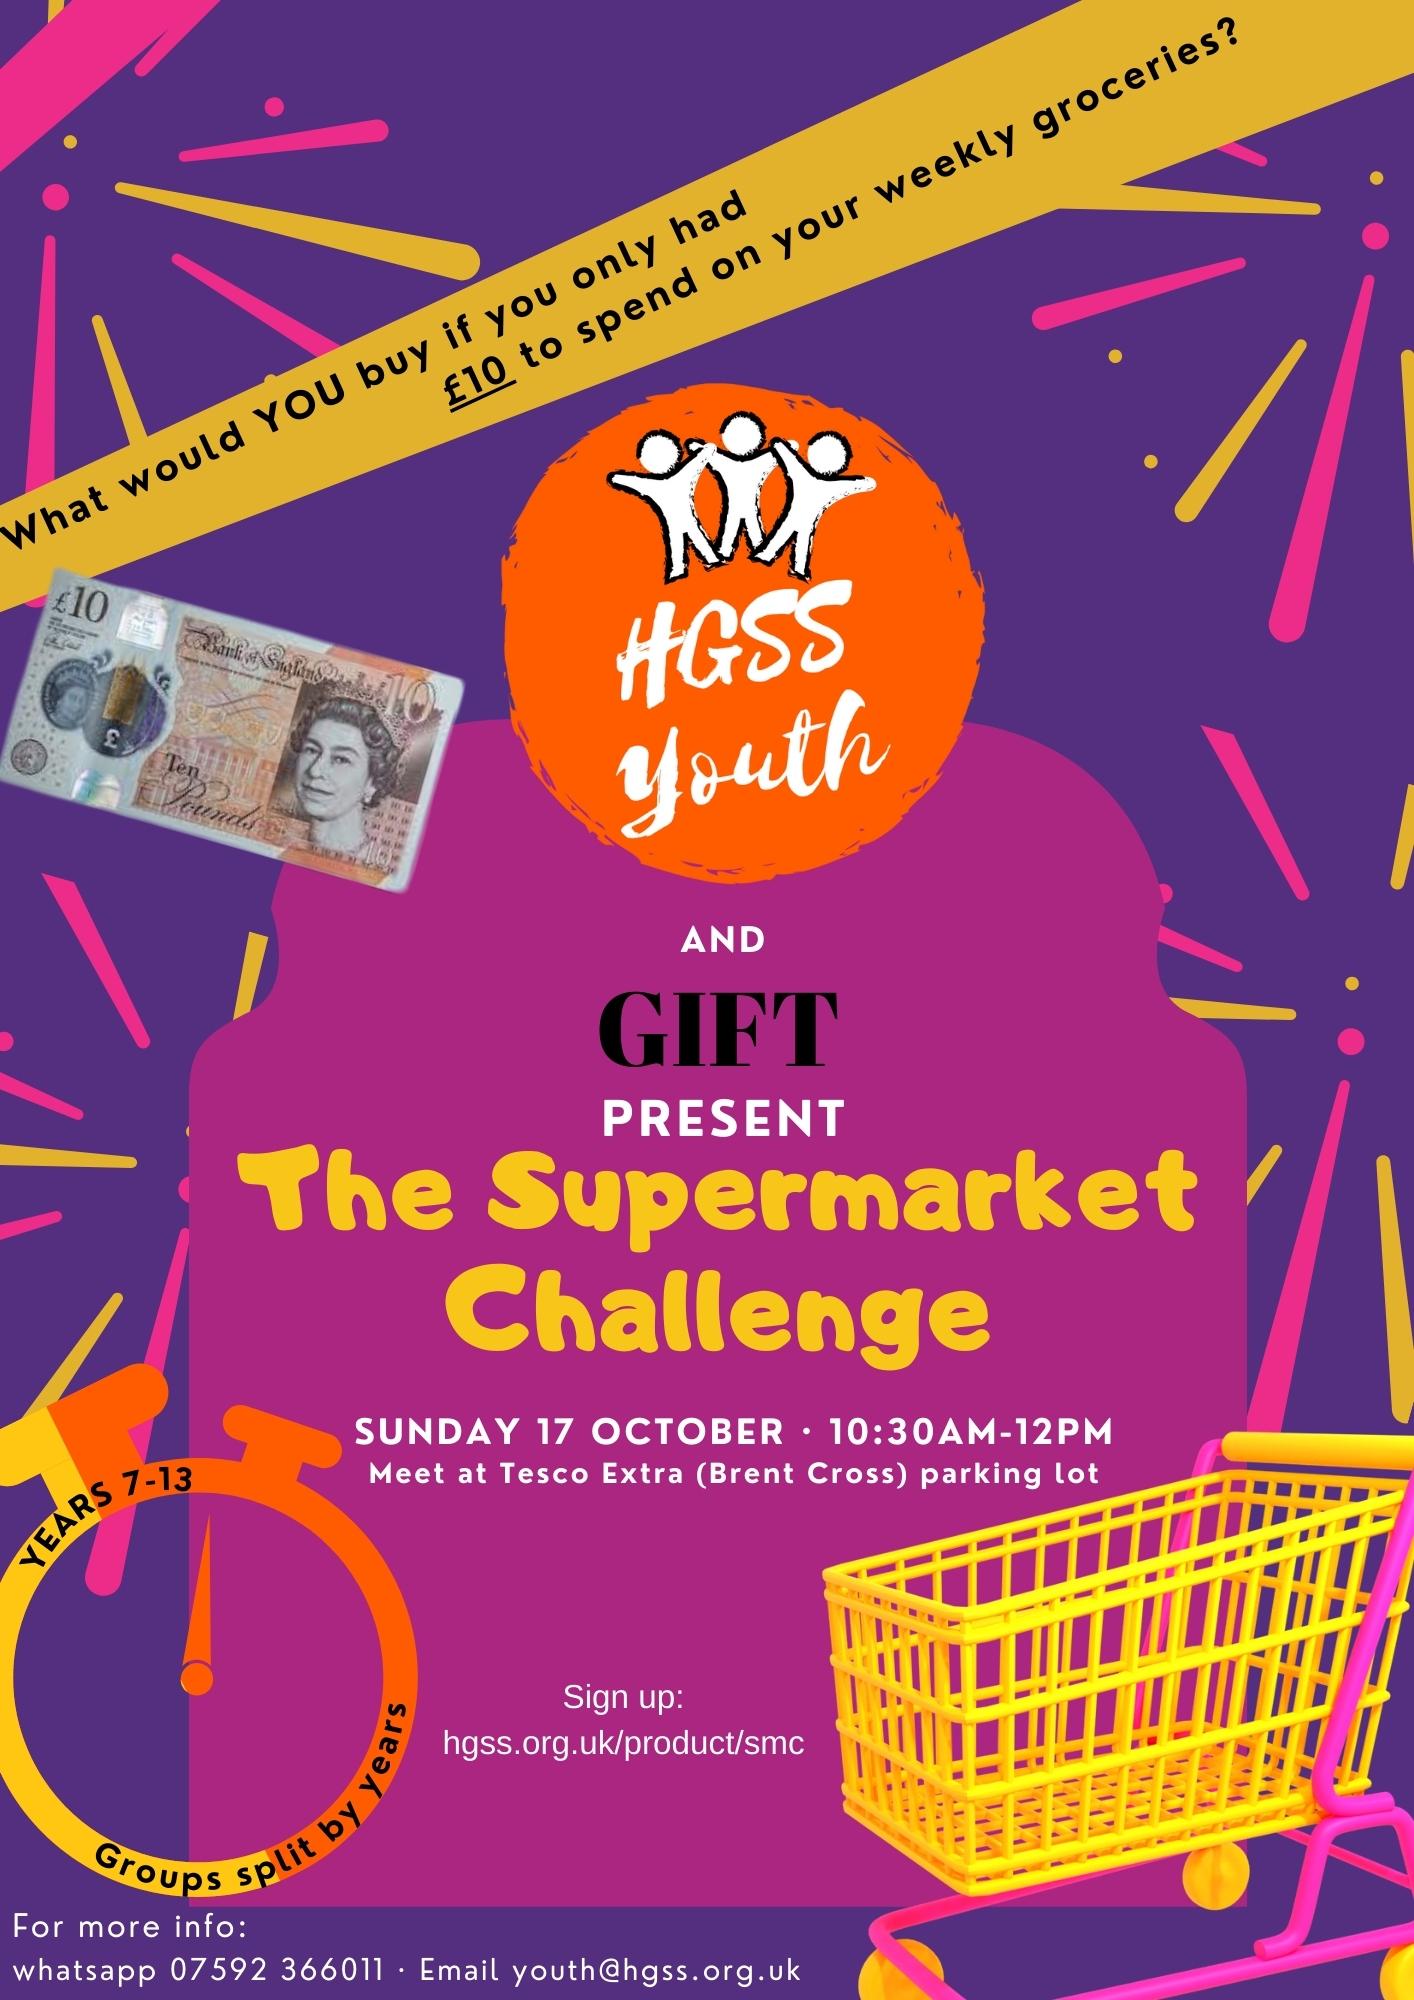 Supermarket Challenge @ Tesco (Brent Cross)